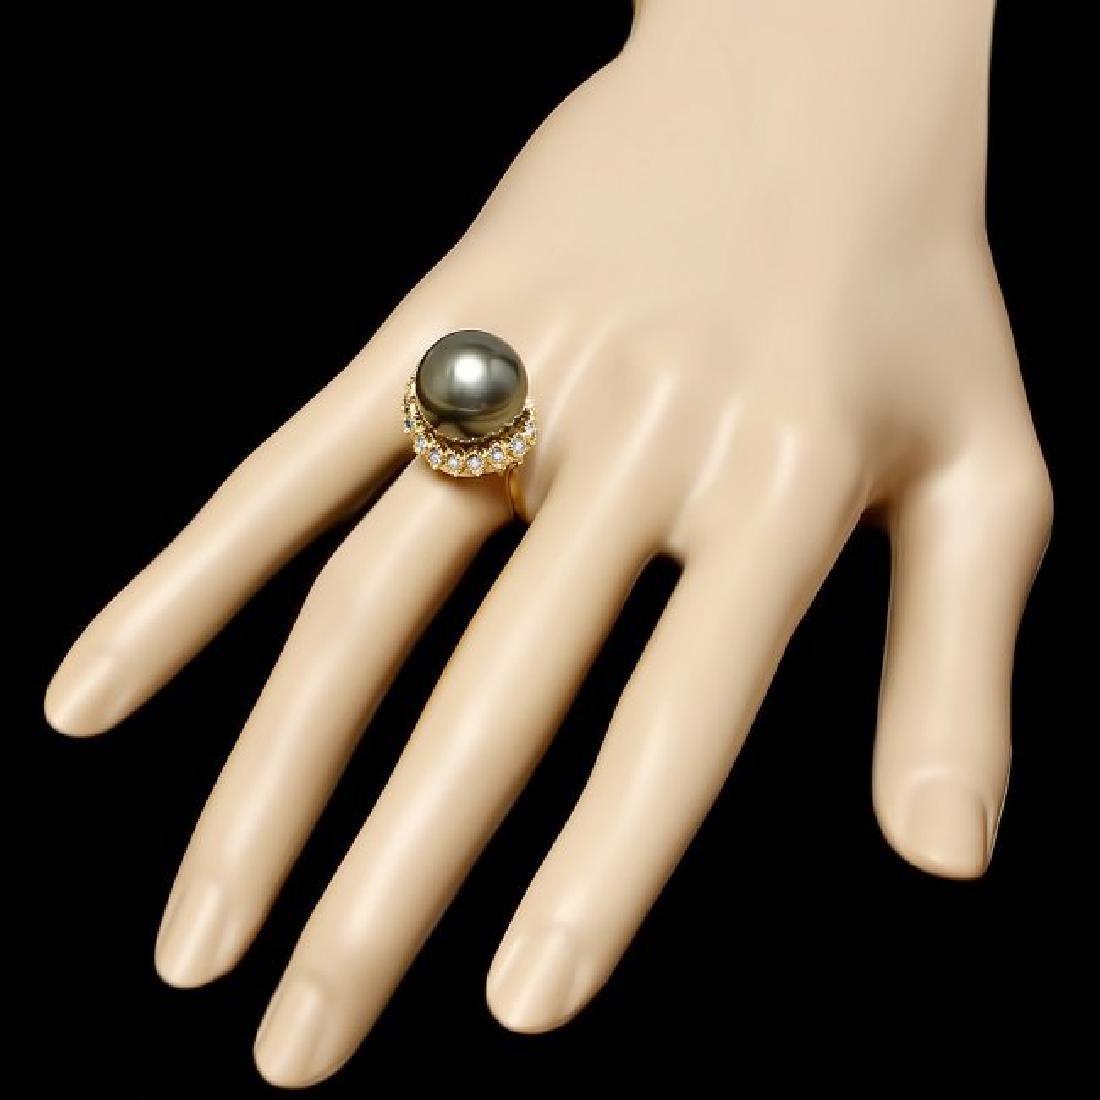 14k Gold 14 X 14mm Pearl 0.64ct Diamond Ring - 3